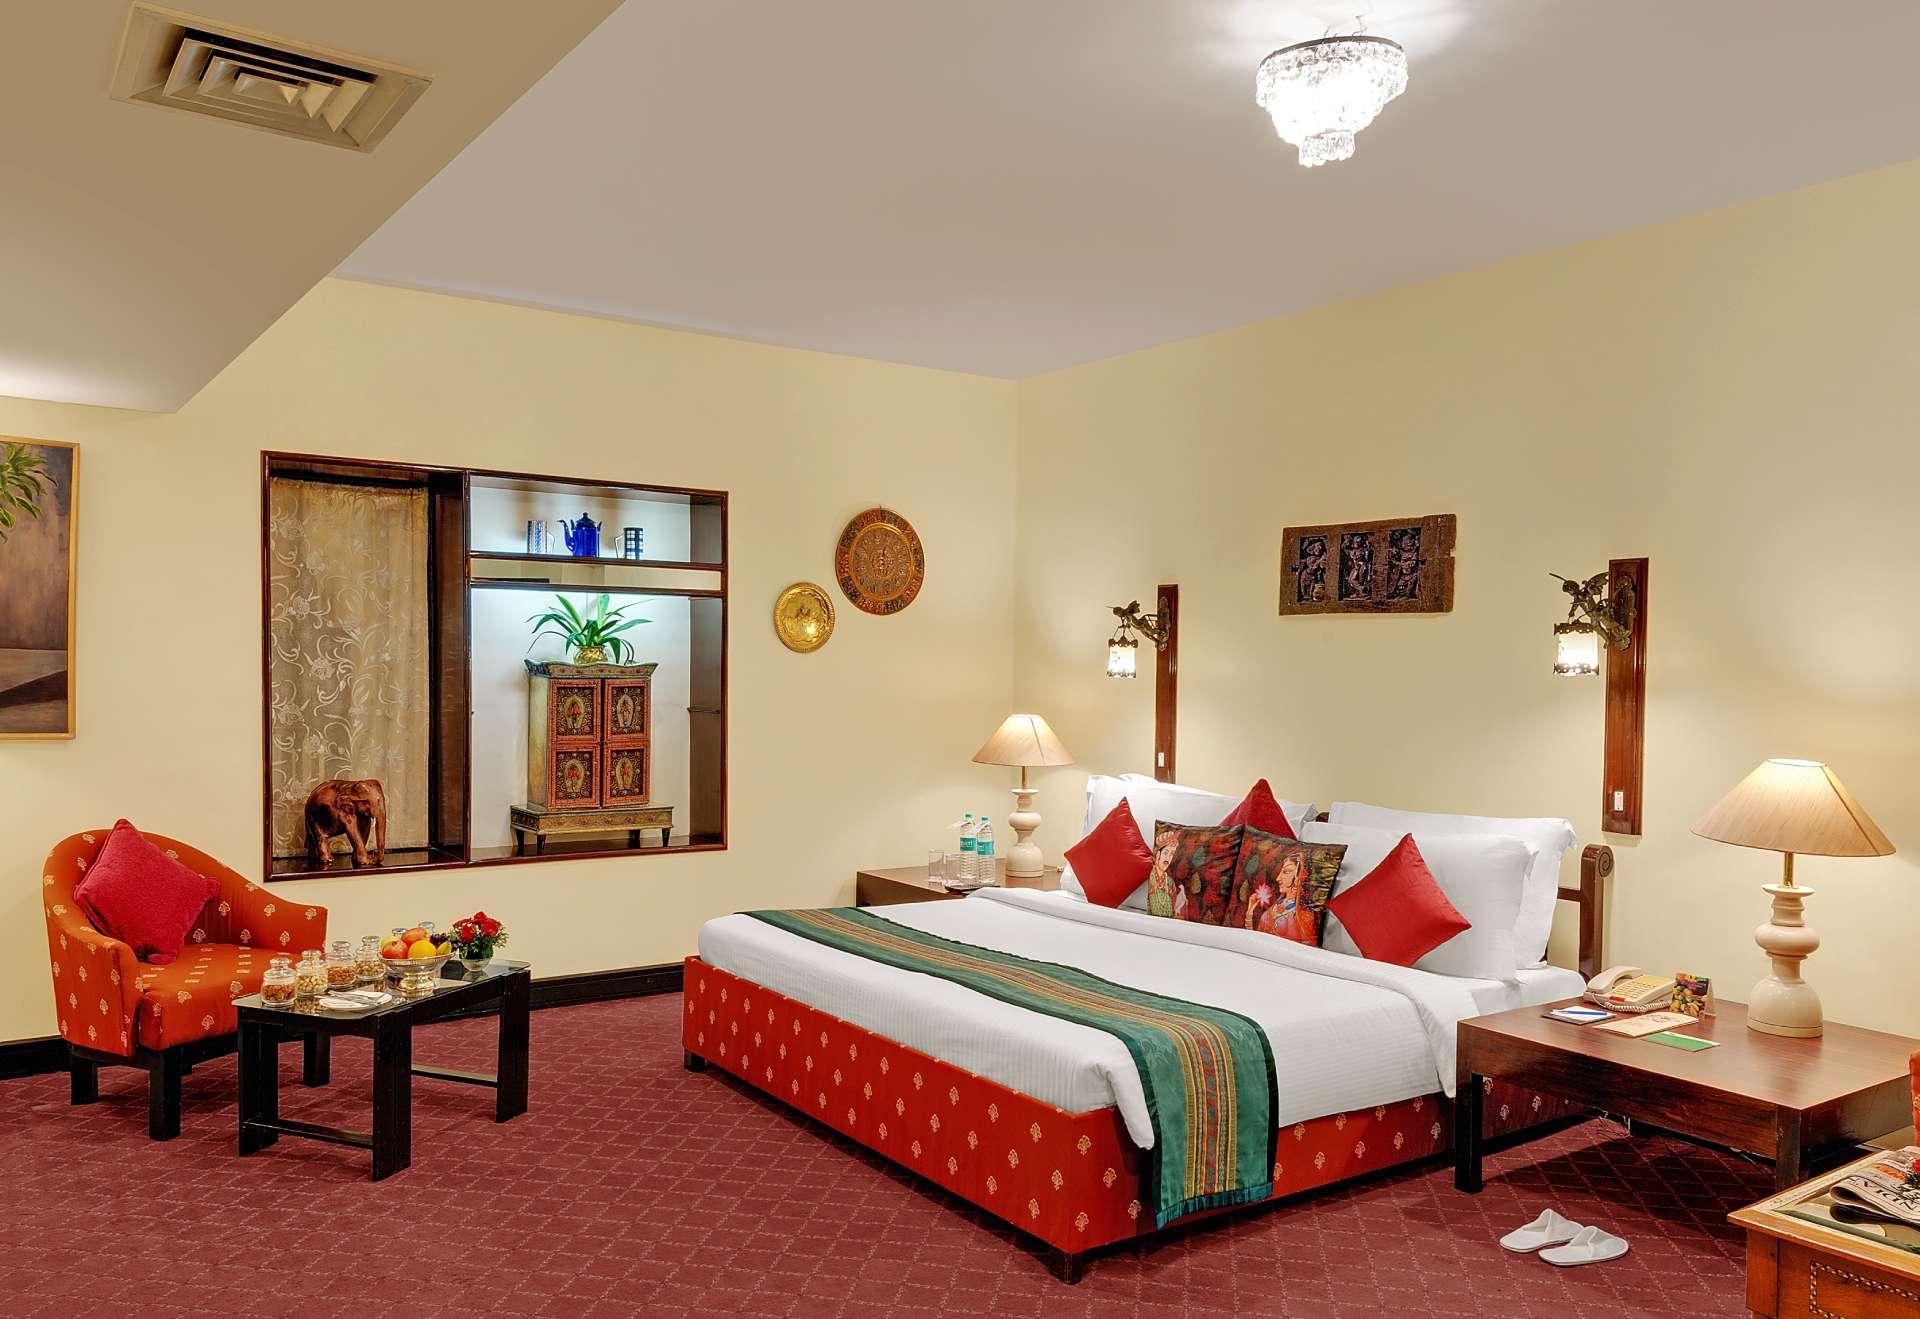 pallava suite ambassador pallava chennai - The Ambassador | Heritage Hotels in Mumbai, Aurangabad, Chennai - Our Rooms